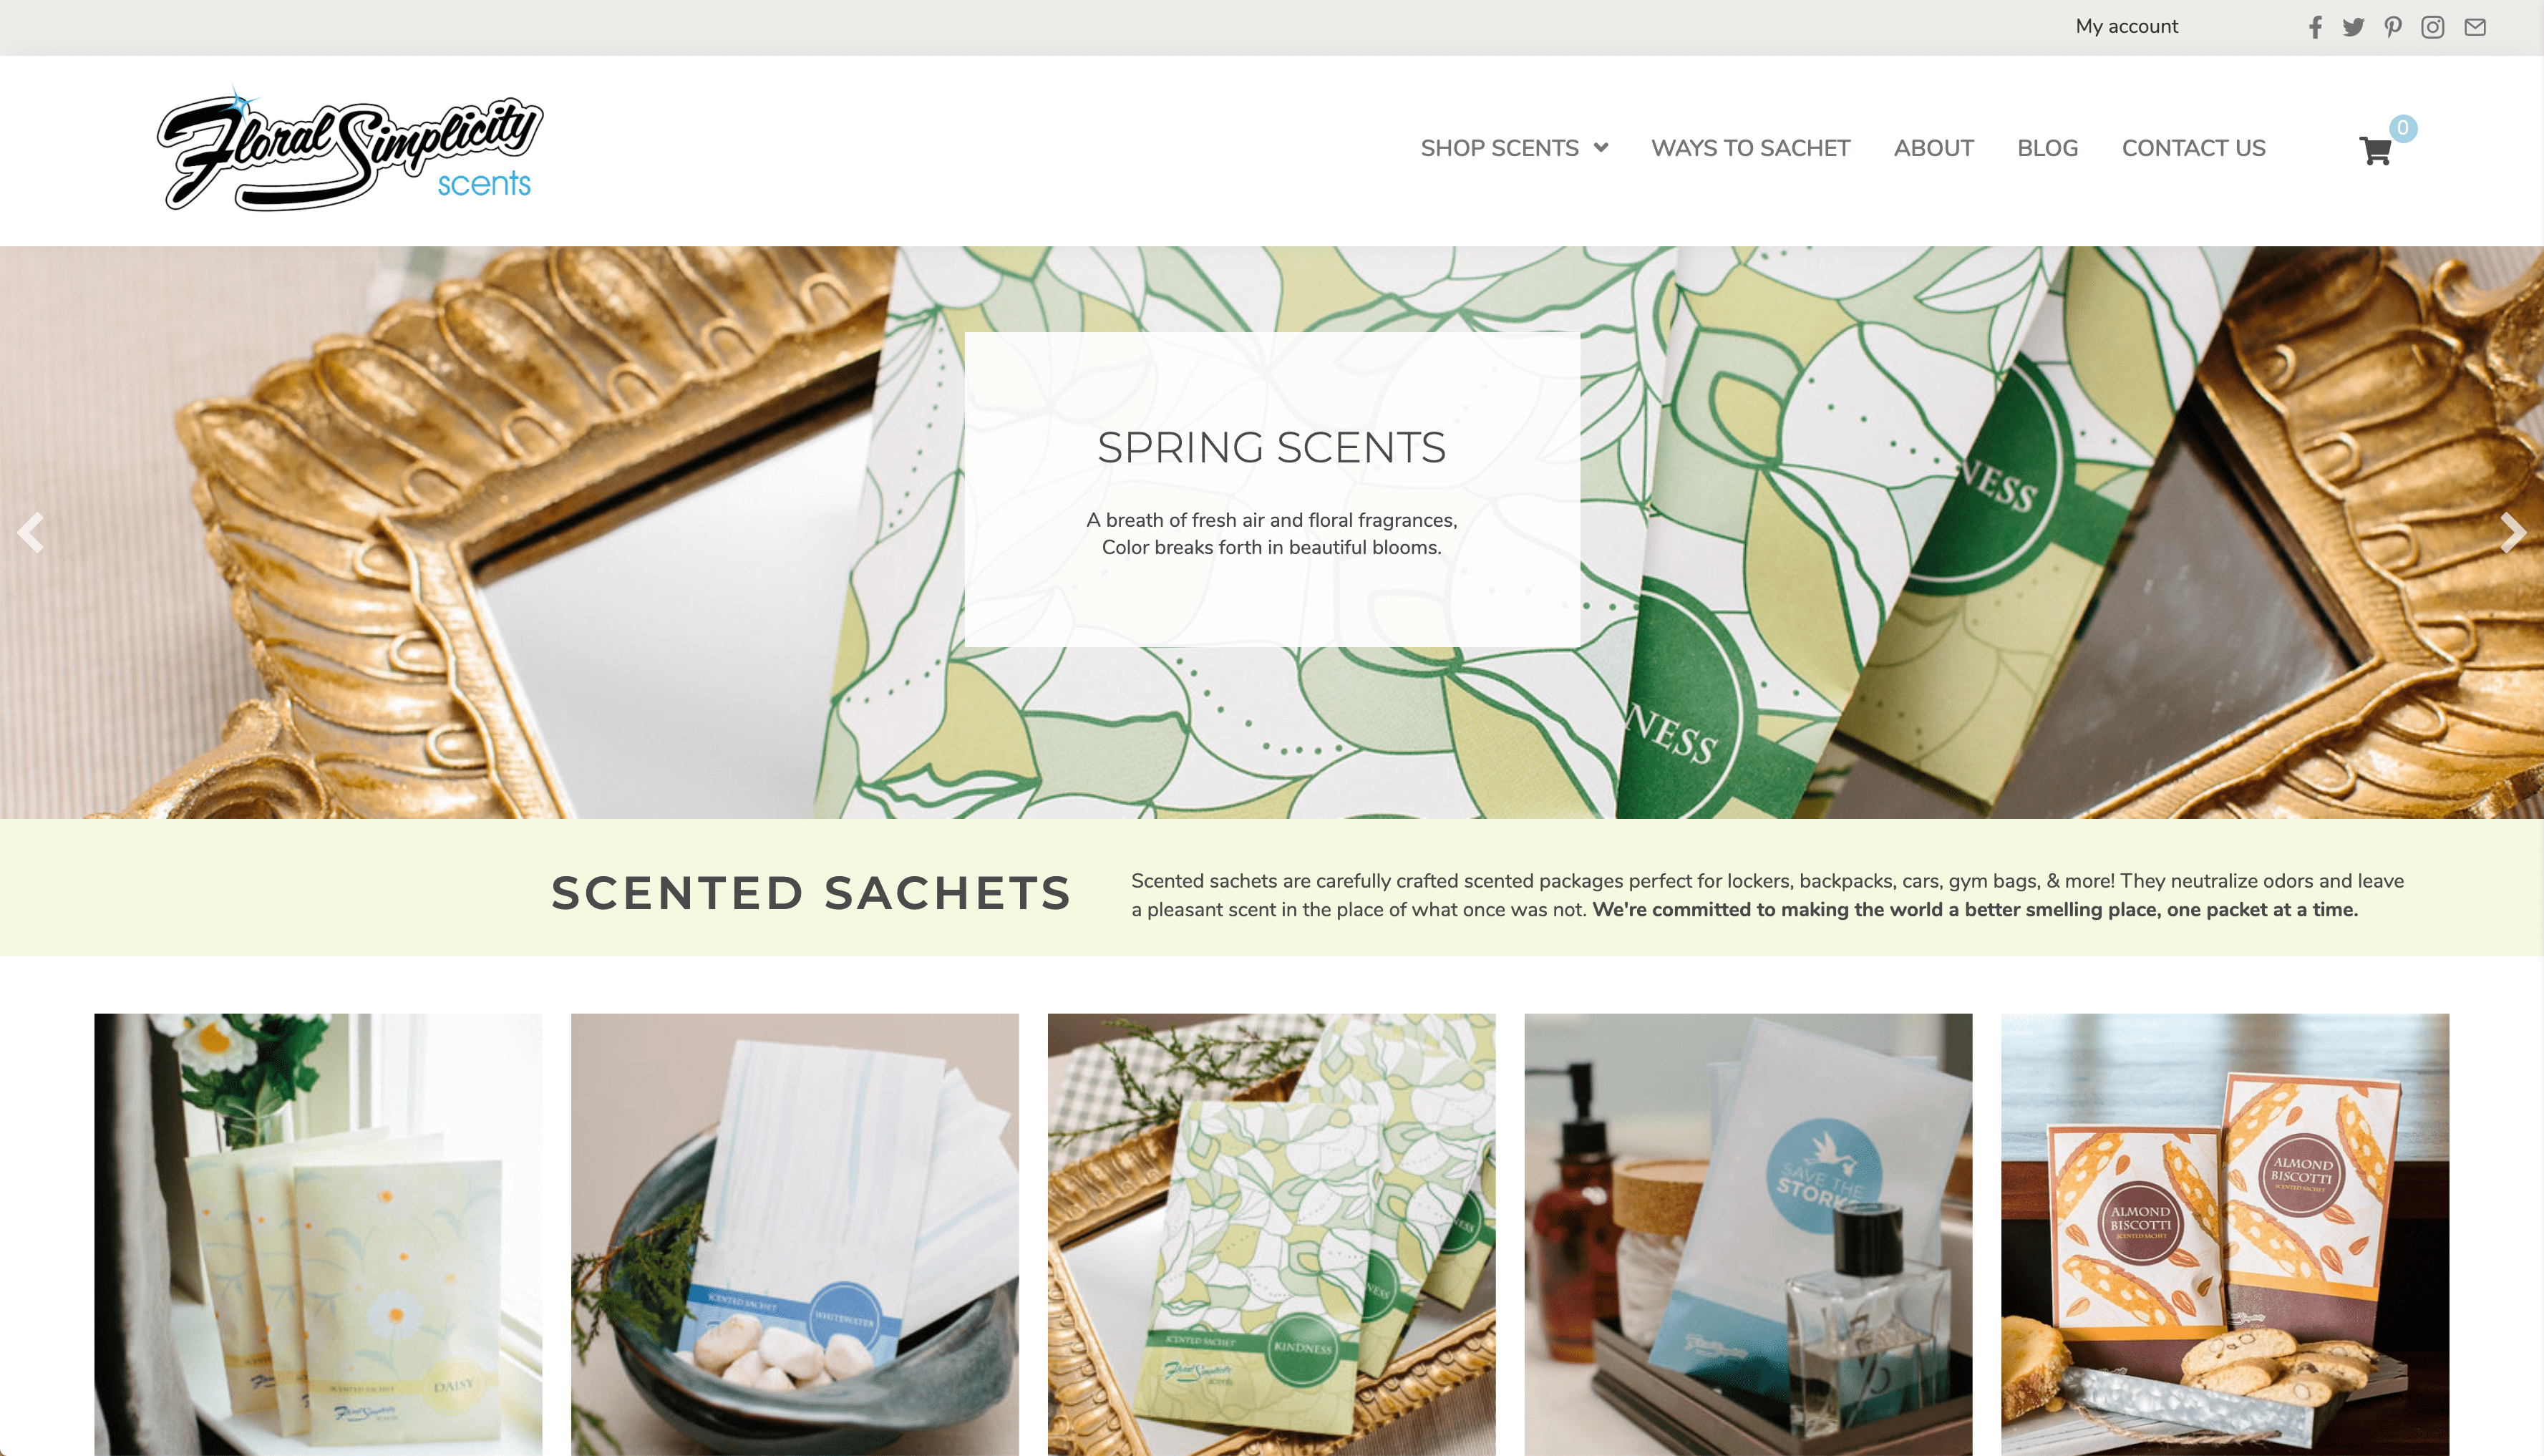 Reflex Brands - Pittsburgh Website Design And Digital Marketing Agency - Image Floral Simplicity